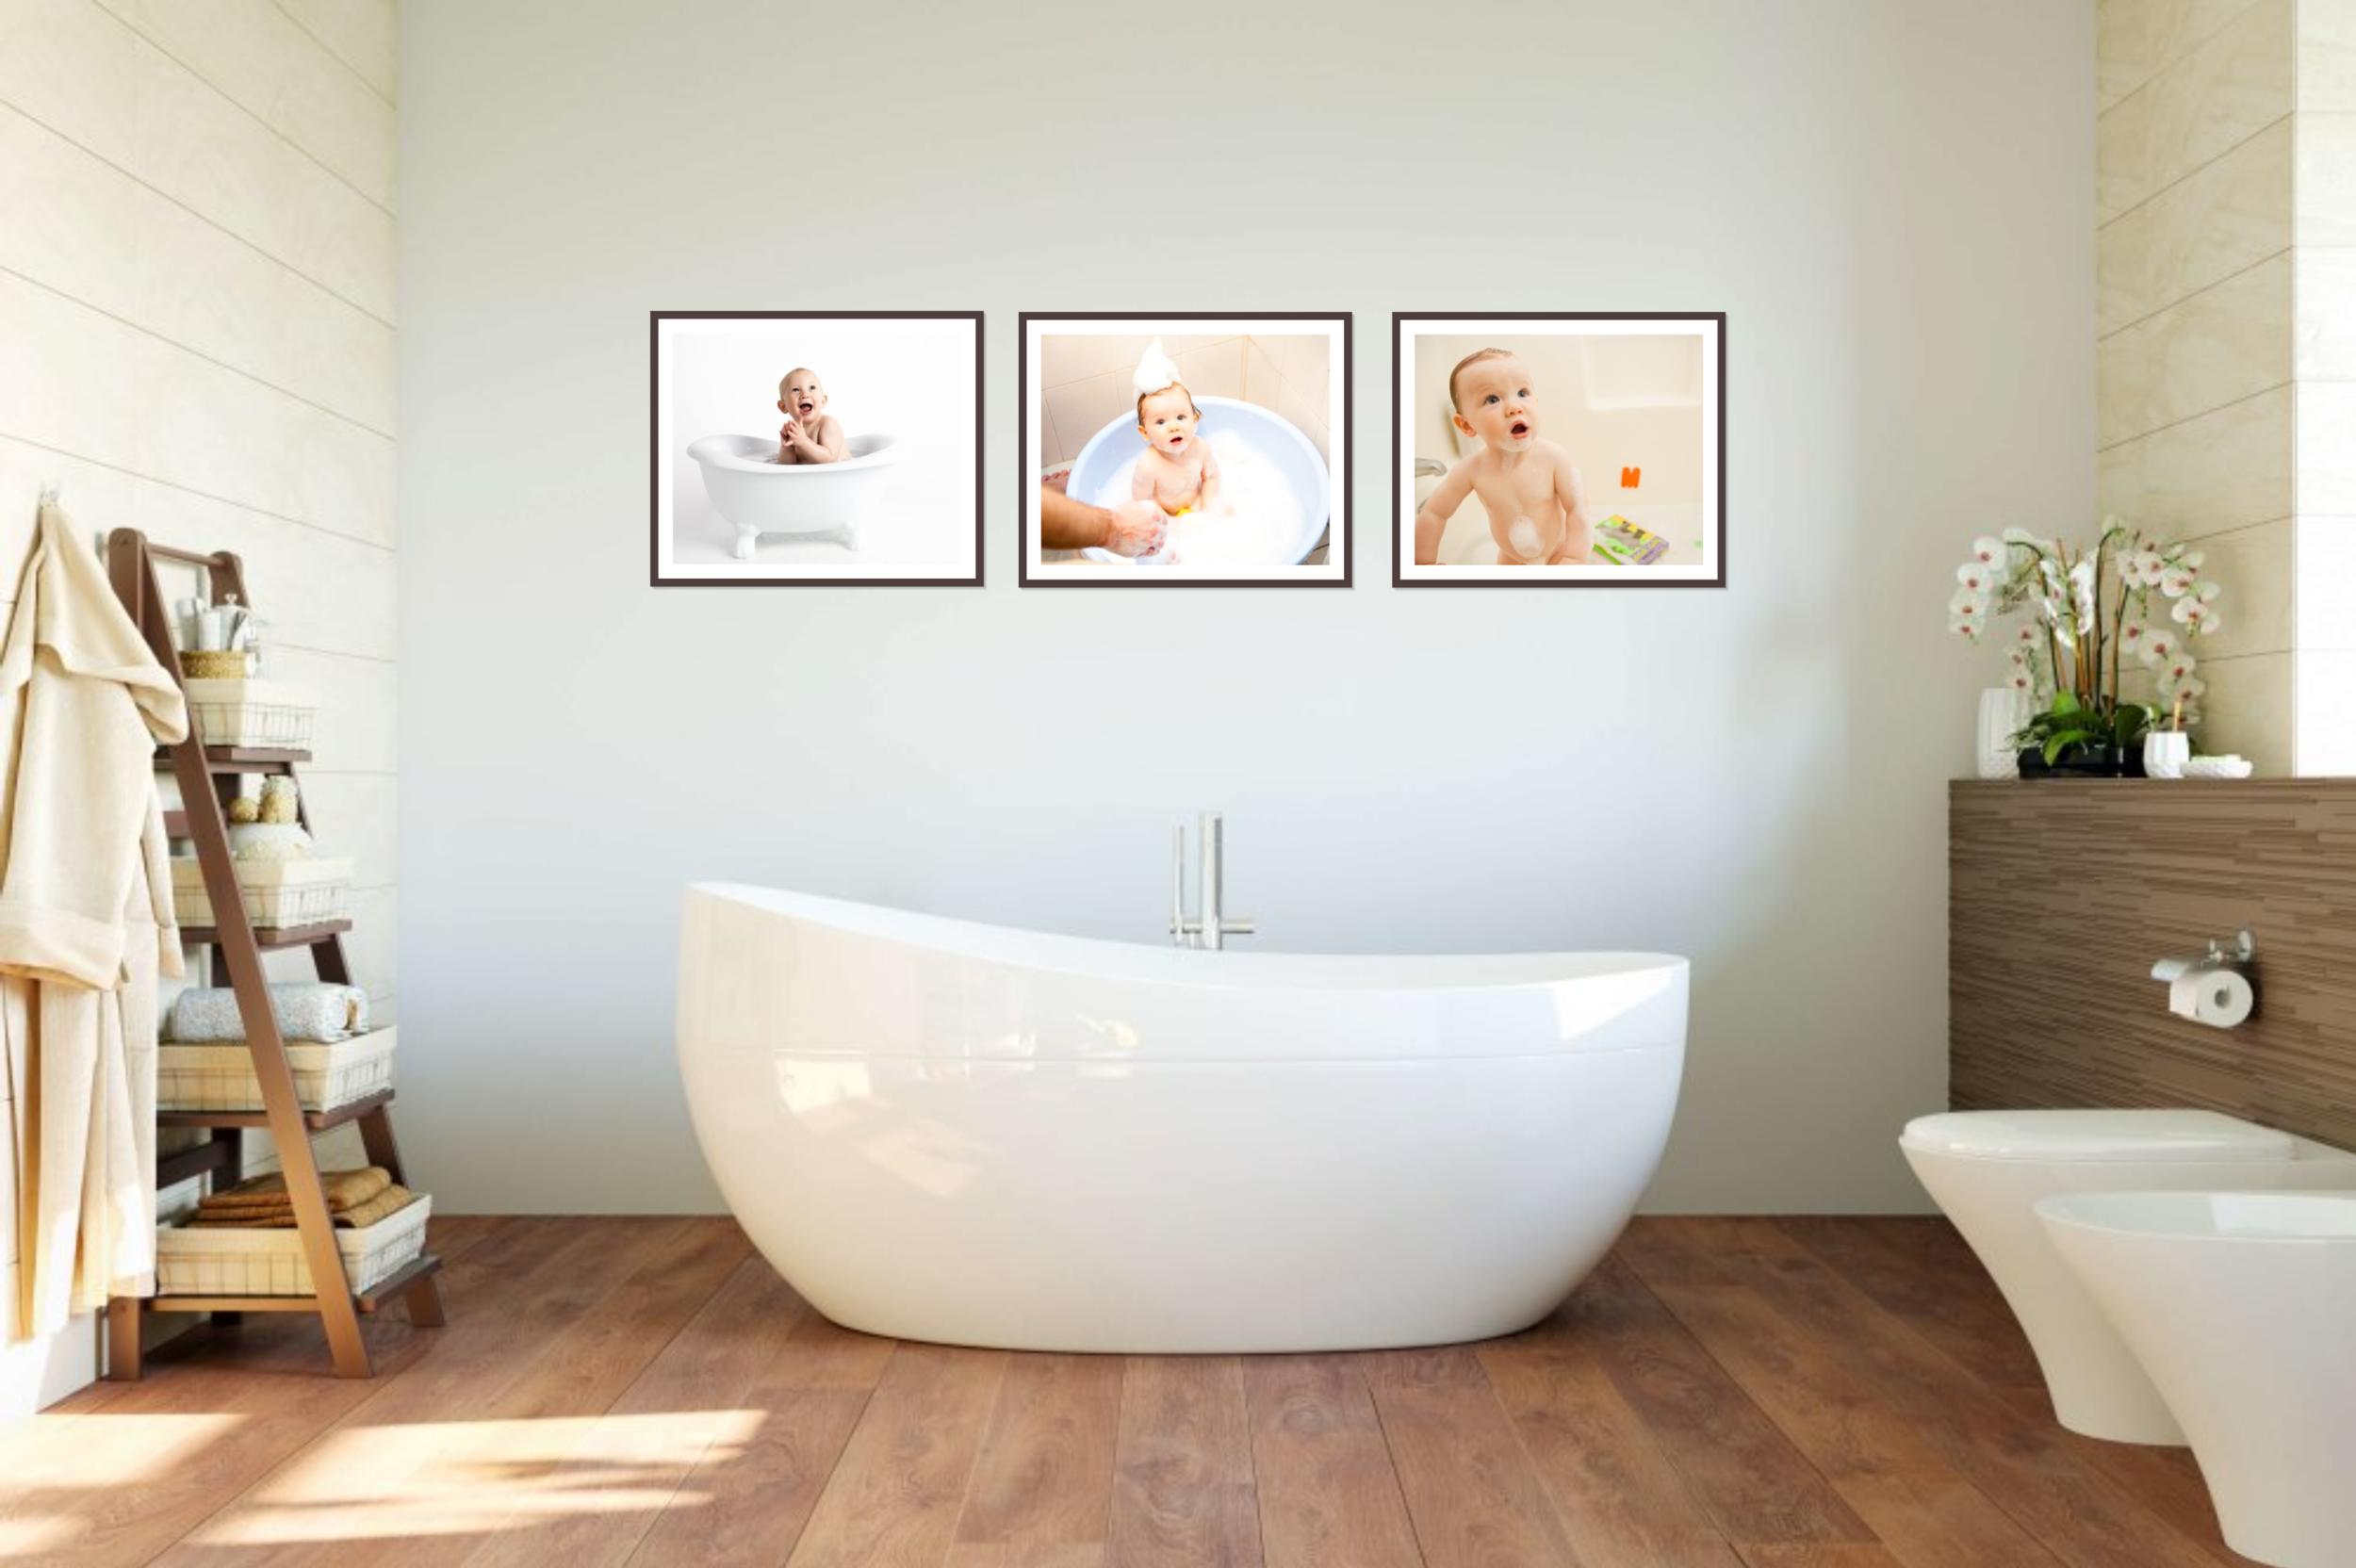 bathroom wall gallery